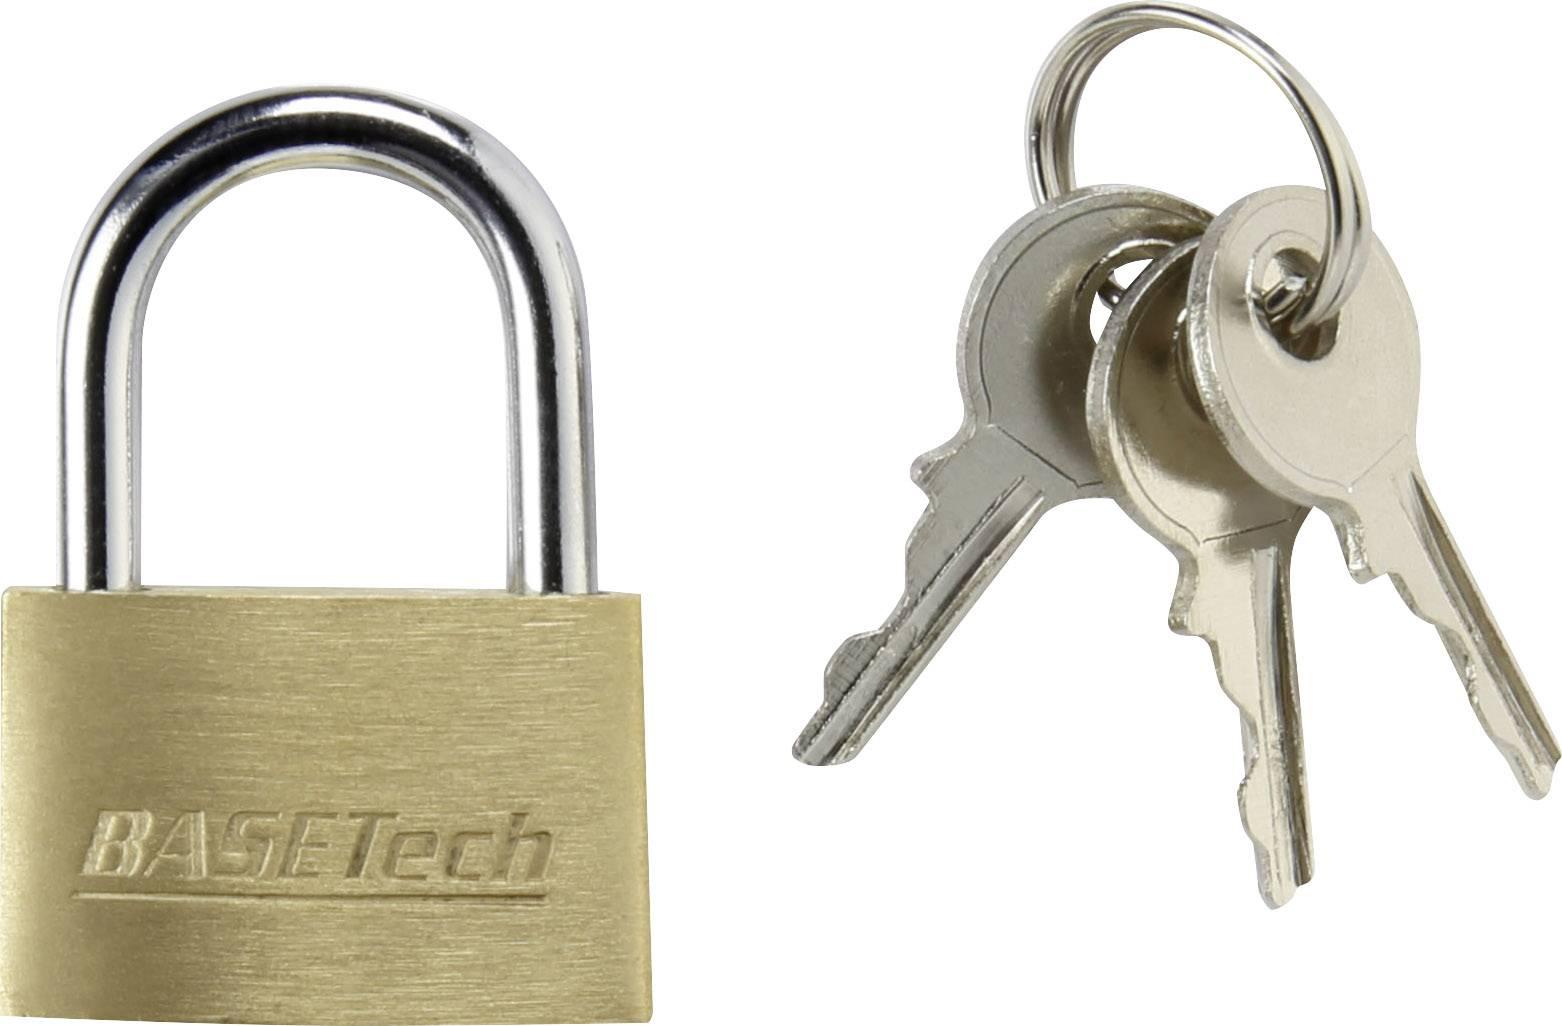 Visiaci zámok na kľúč Basetech 1362939, 24.7 mm, mosadz